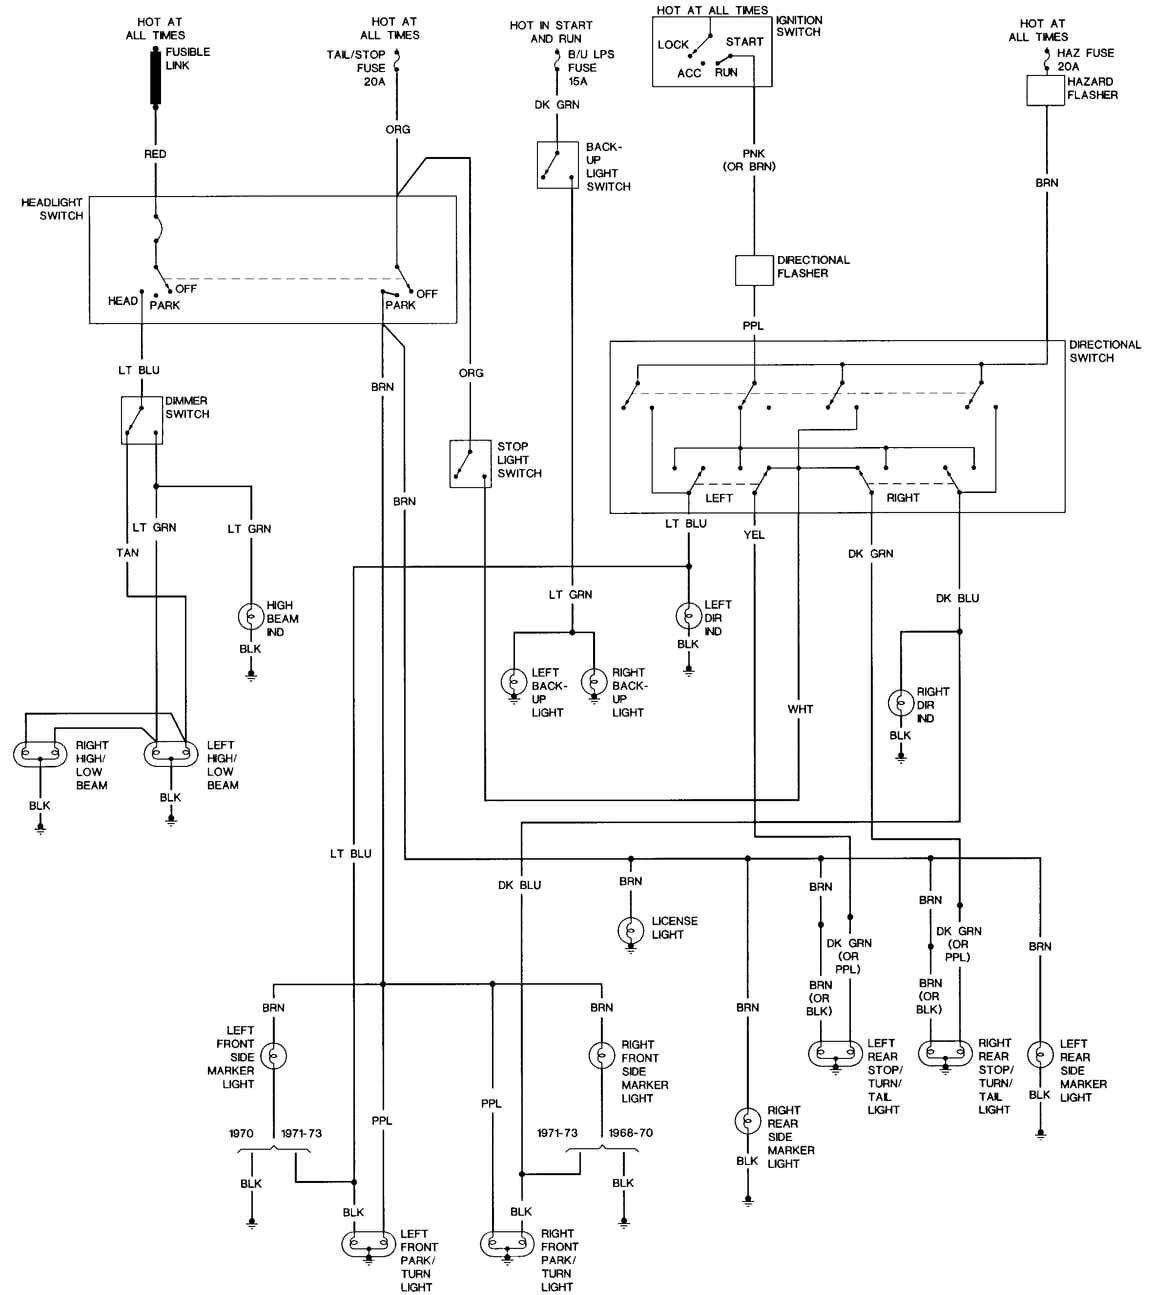 [QNCB_7524]  WT_2038] 3 Wire Switch Wiring Diagram 69 Mustang Download Diagram | 3 Wire Switch Wiring Diagram 69 Mustang |  | Icand Seve Hete Kicep Mohammedshrine Librar Wiring 101